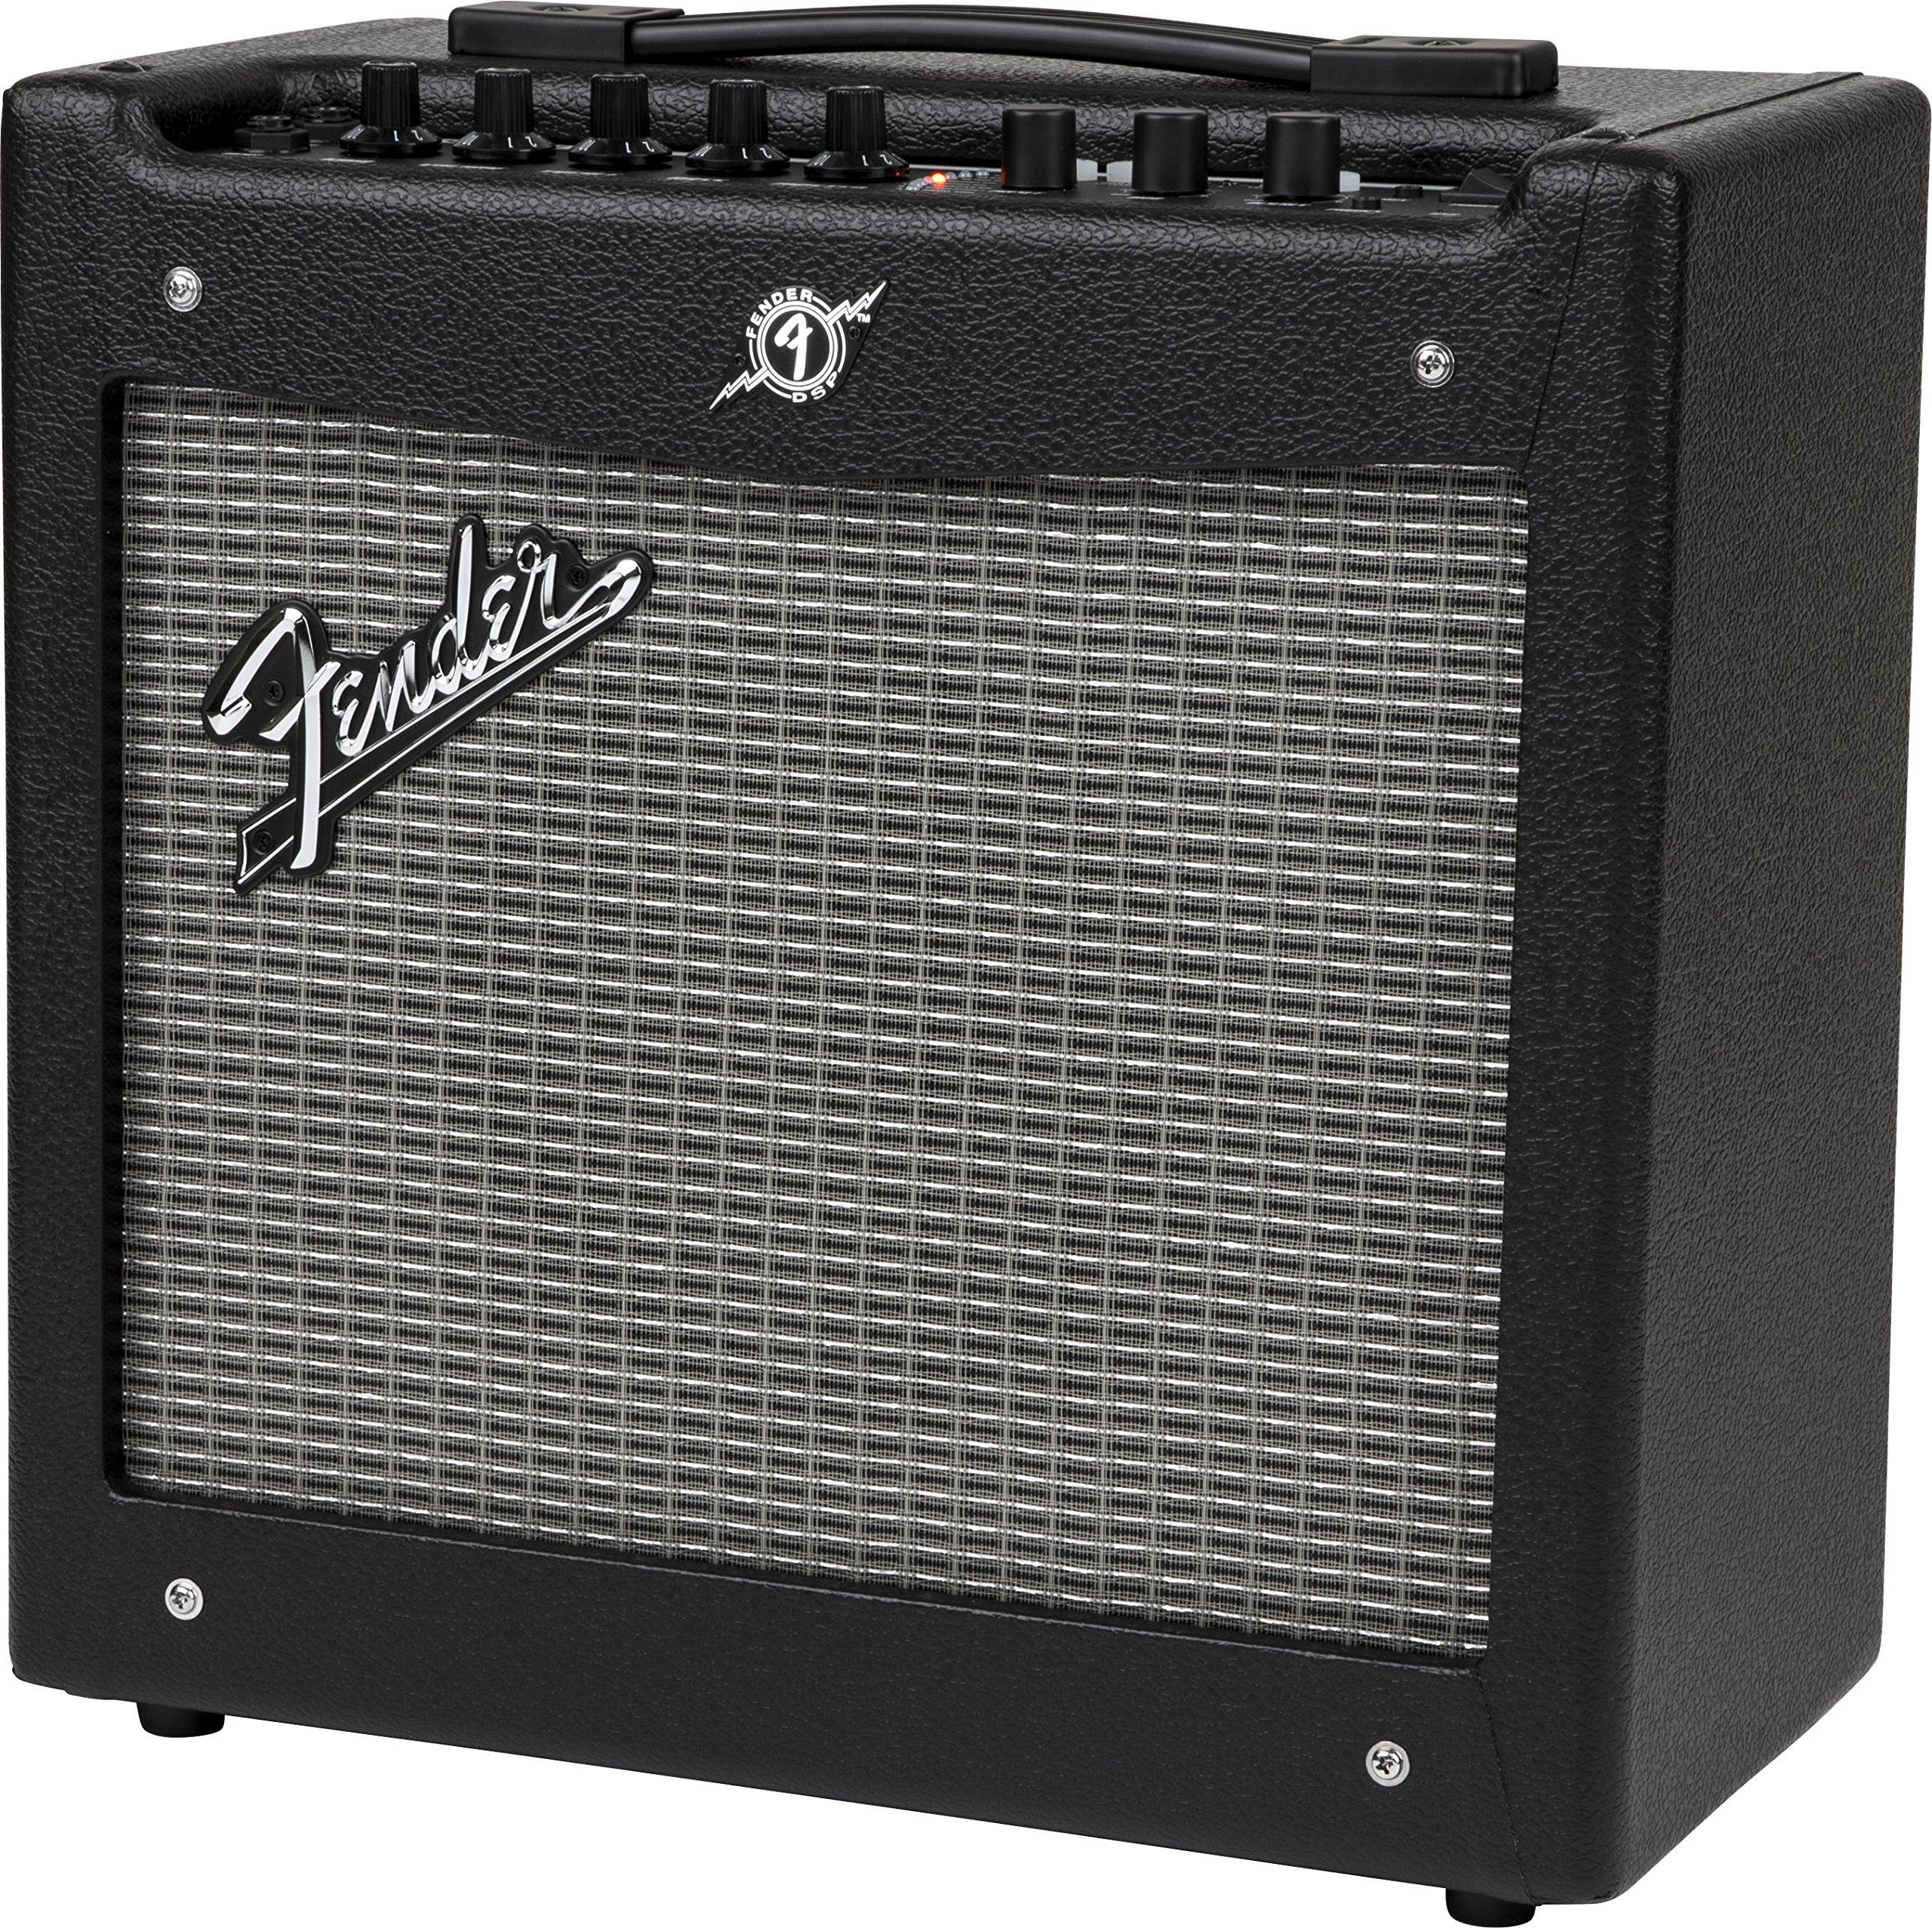 Fender Mustang I V2 20-Watt 1x8-Inch Combo Electric Guitar Amplifier by Fender